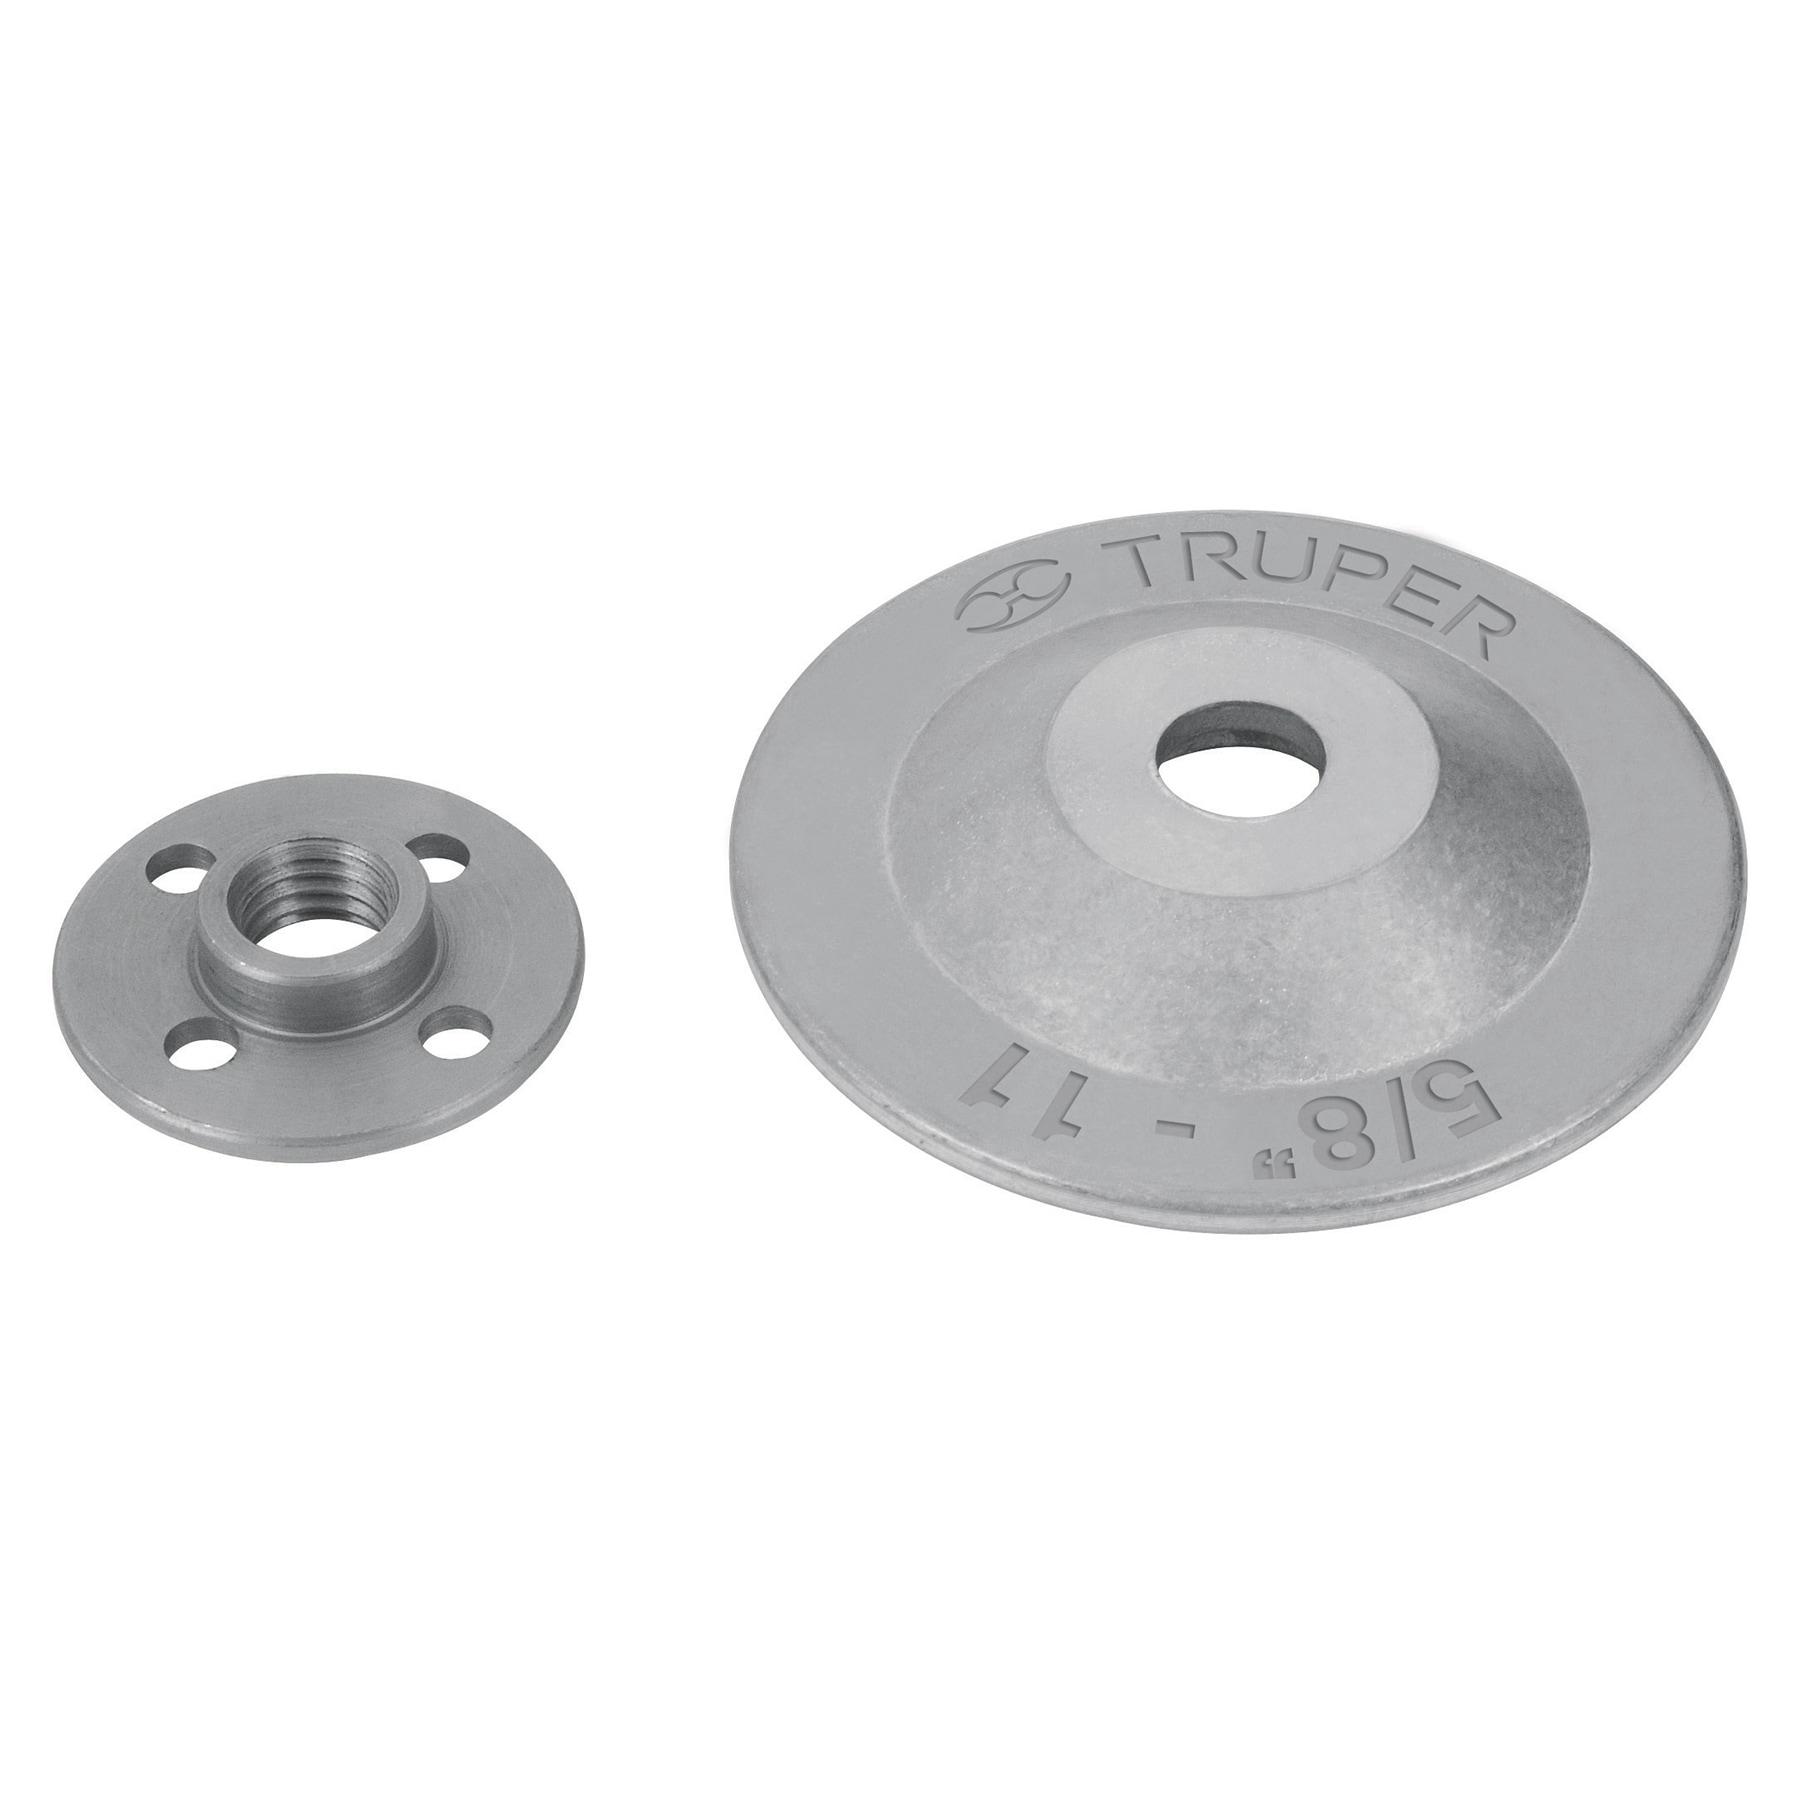 Adaptador para discos tipo 42, rosca 5/8-11 NC, de 7-9'